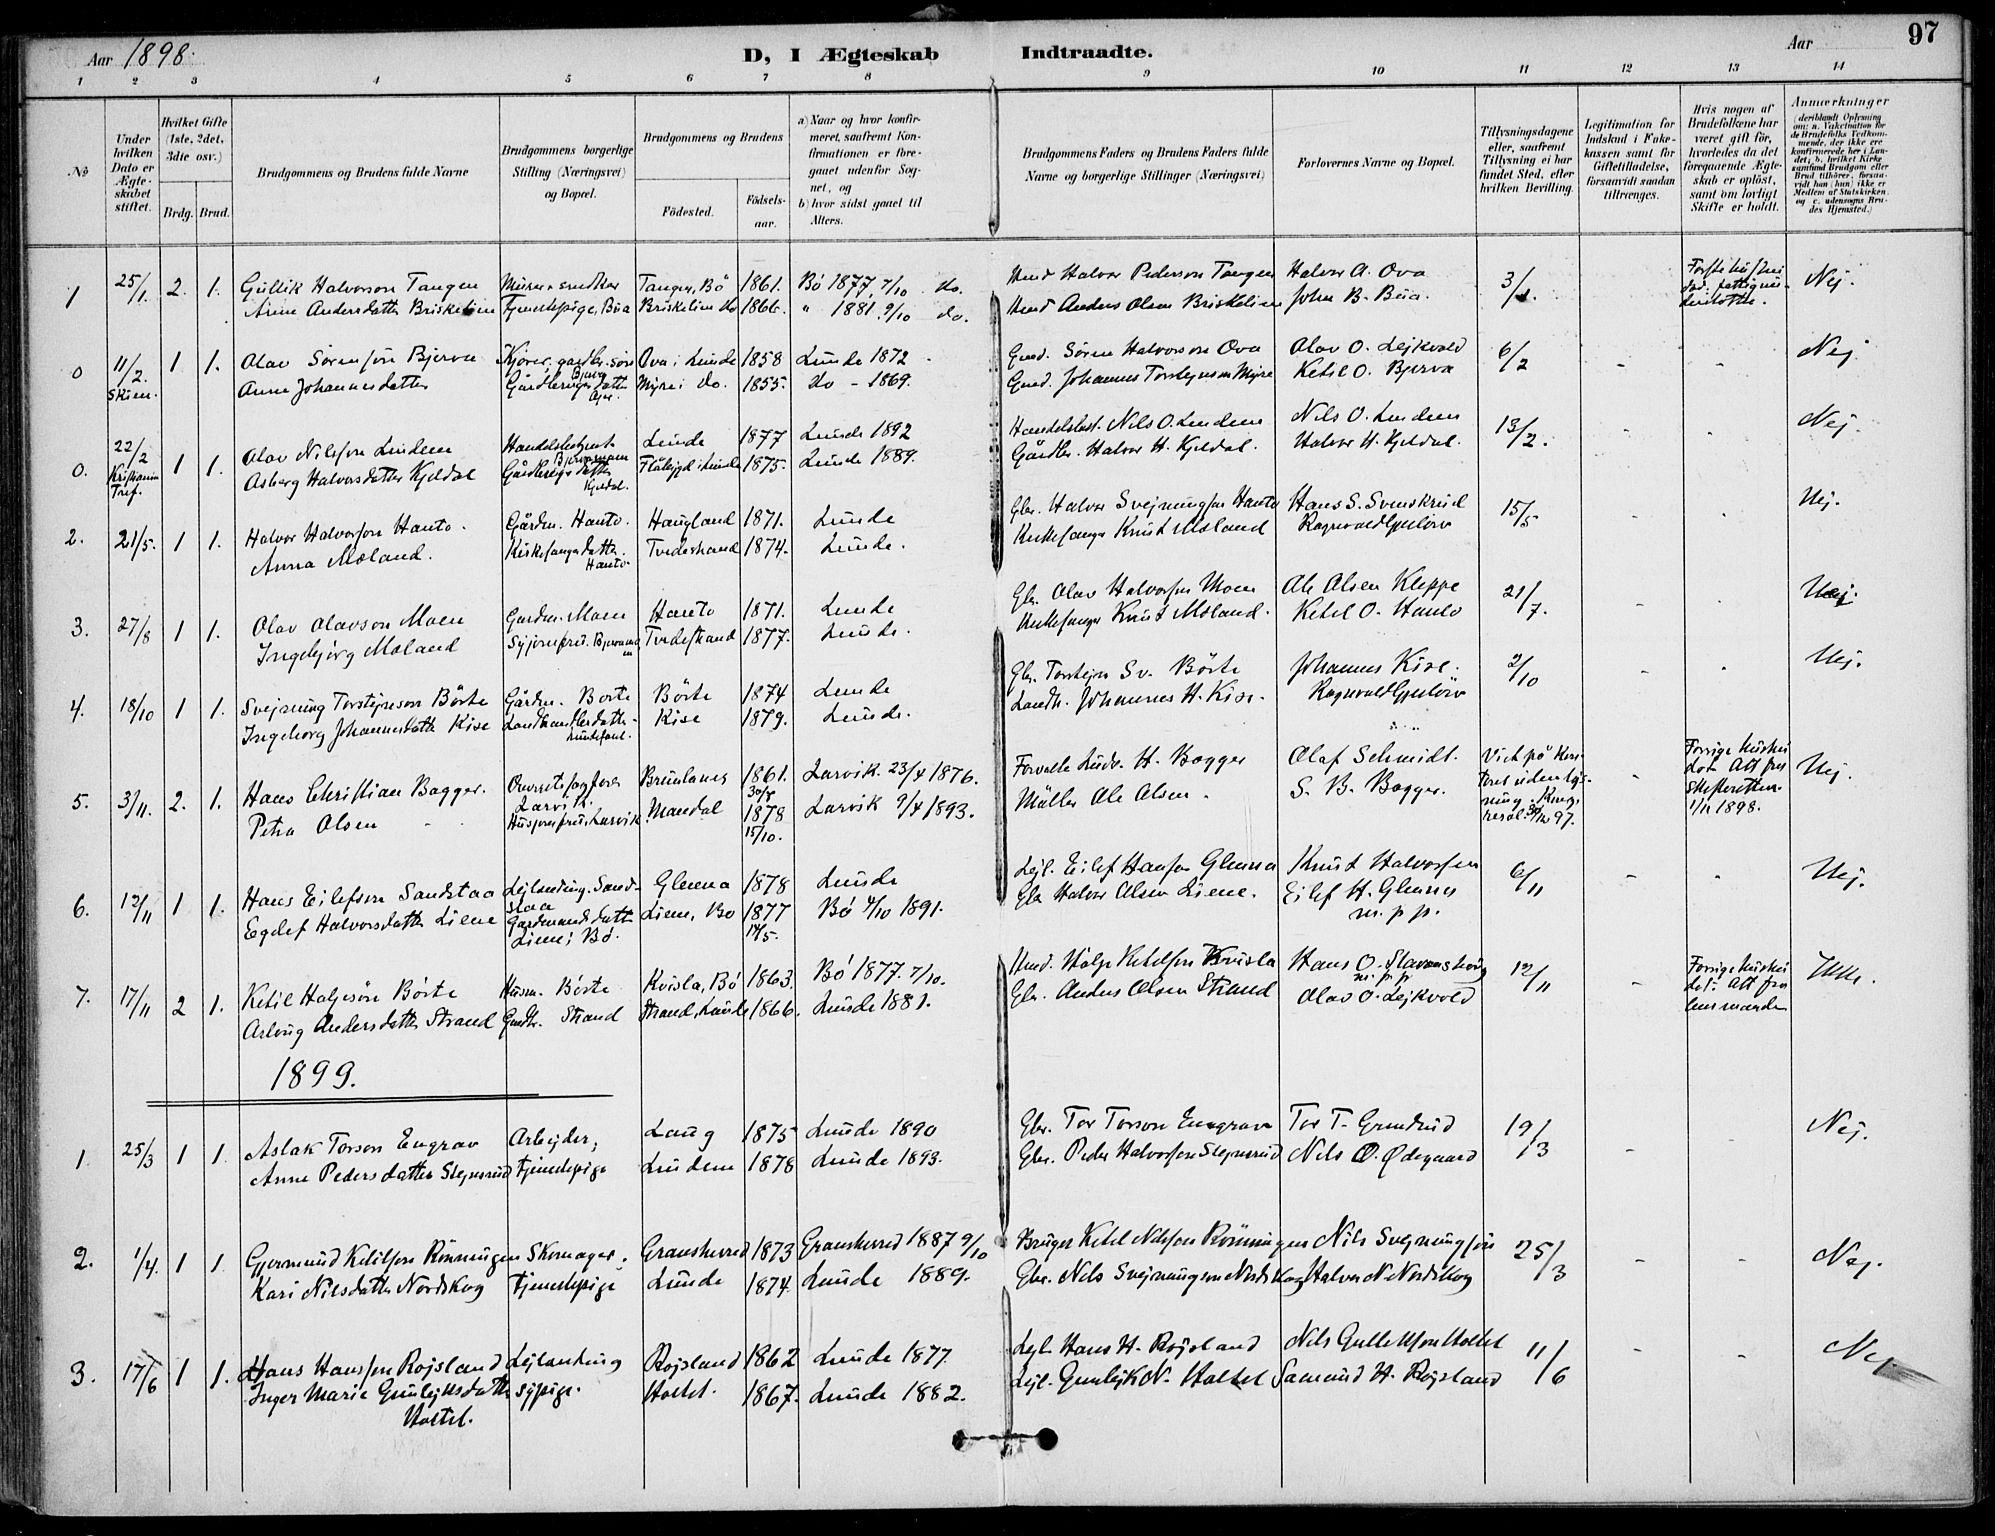 SAKO, Lunde kirkebøker, F/Fa/L0003: Ministerialbok nr. I 3, 1893-1902, s. 97